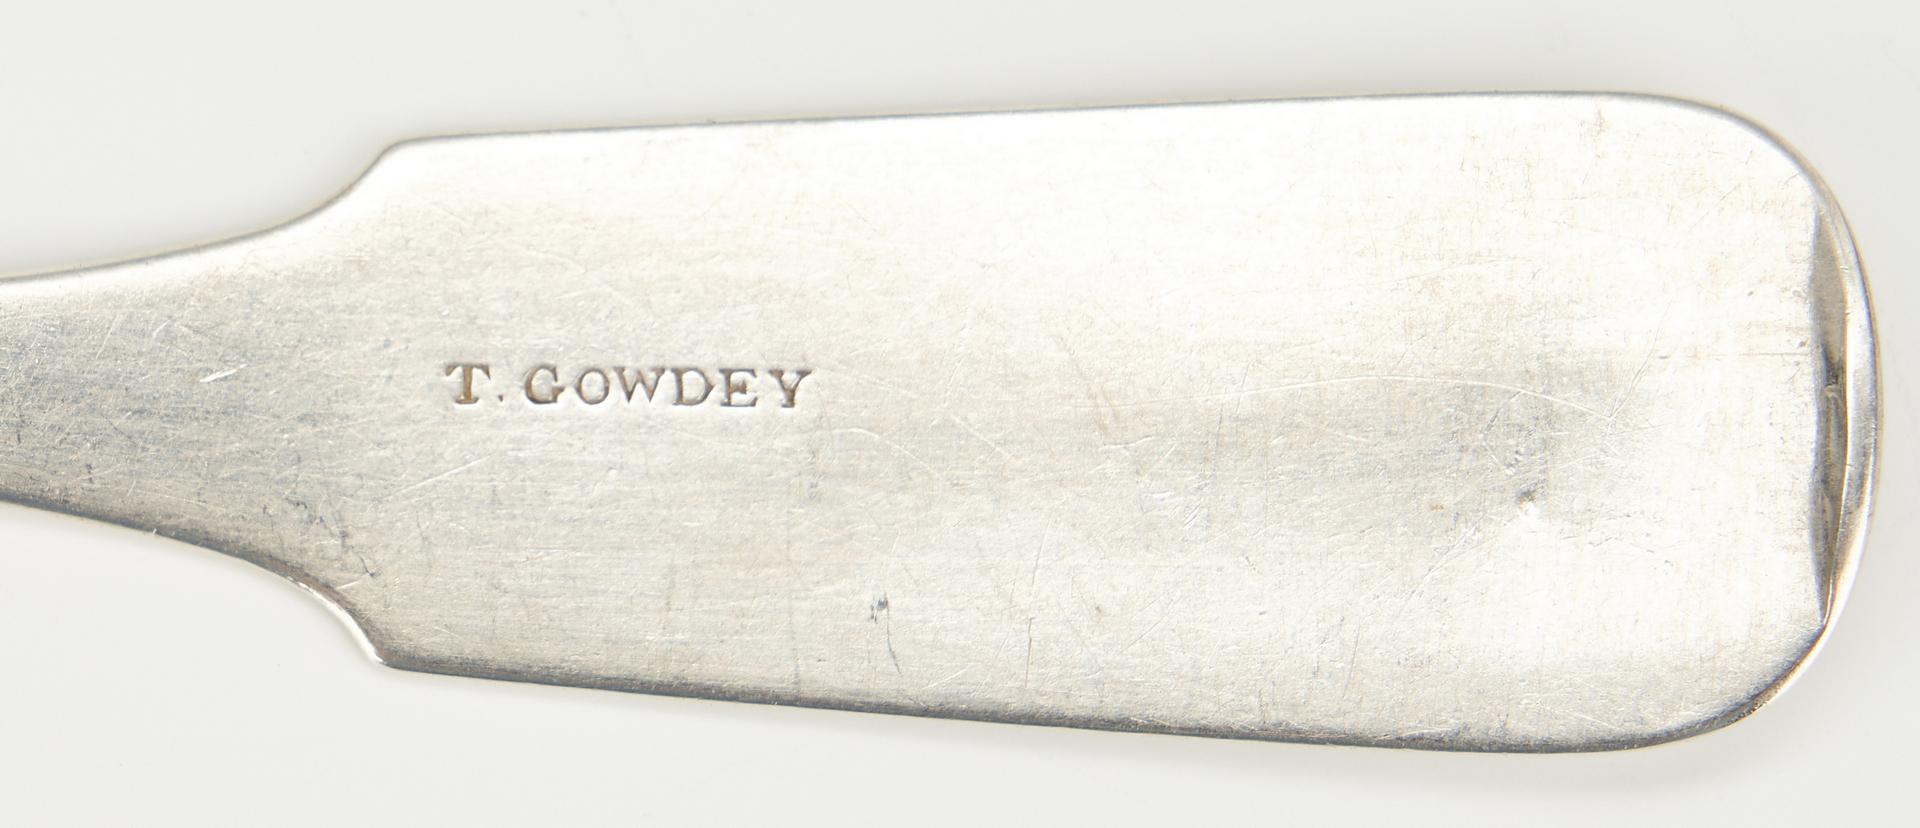 Lot 83: 10 TN Coin Silver Teaspoons, Peabody & Gowdy